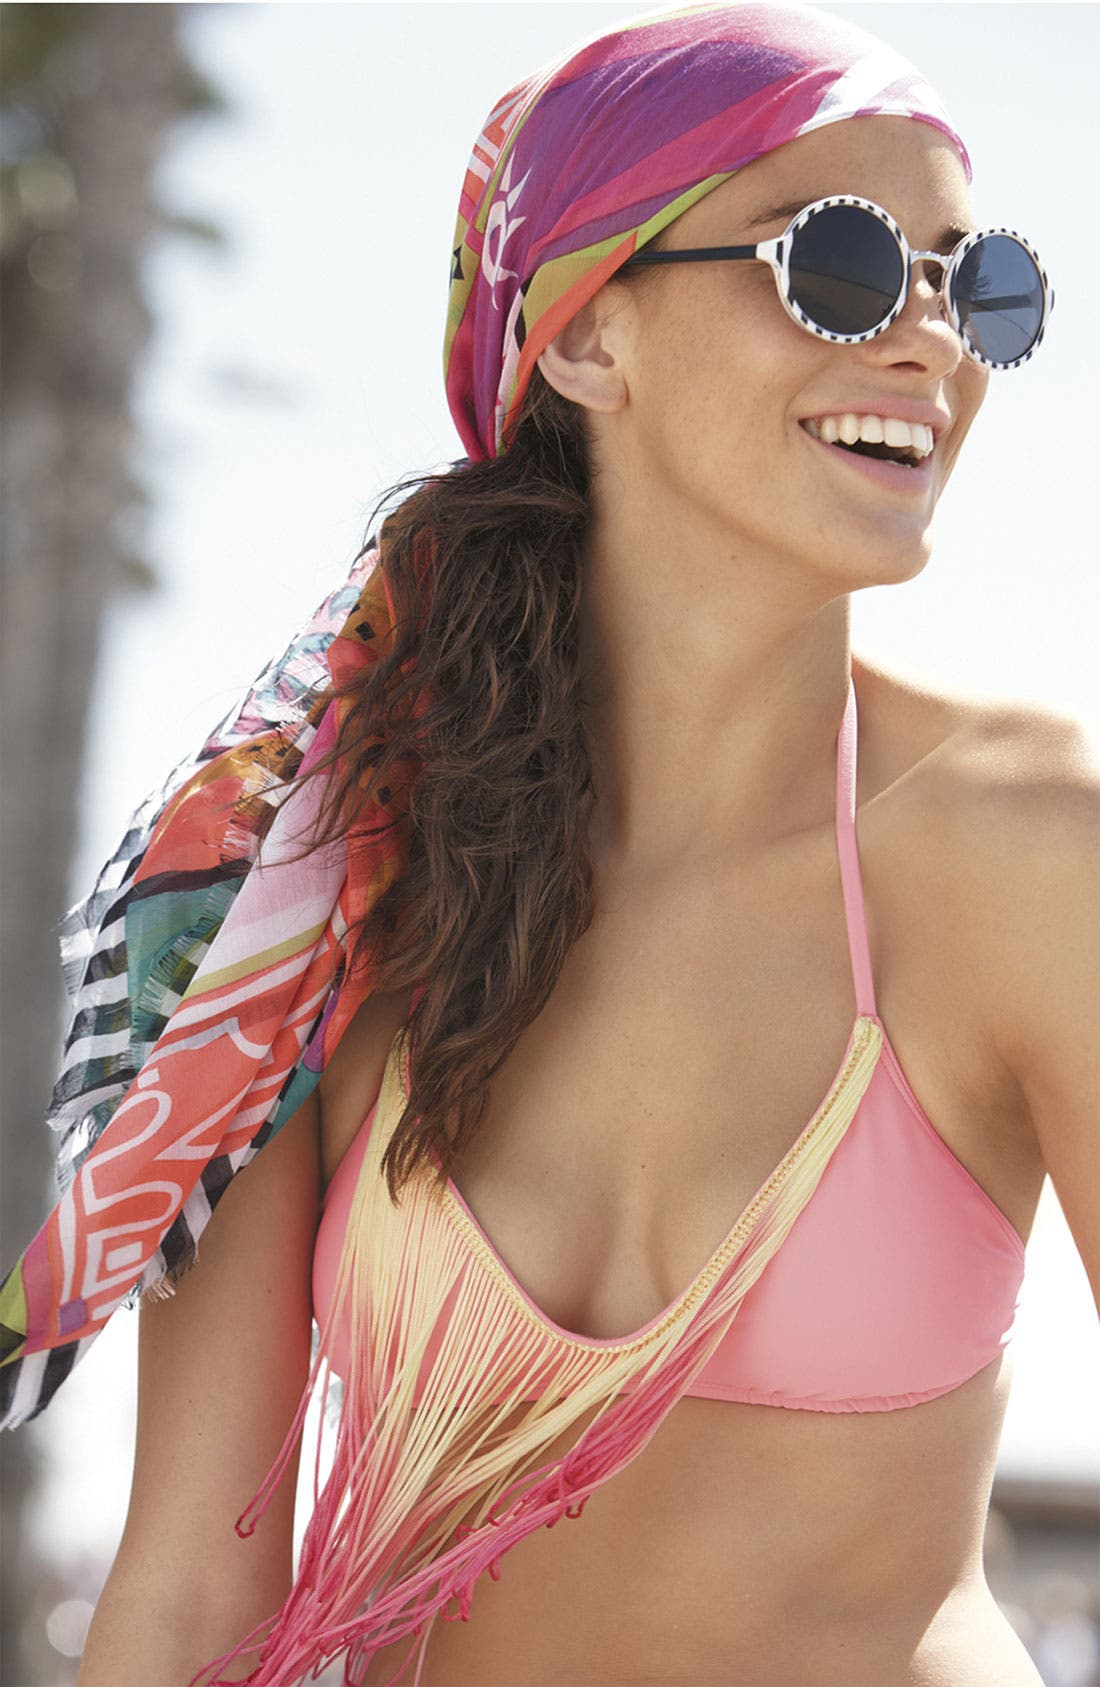 Alternate Image 1 Selected - The Bikini Lab Bikini Top & Bottoms